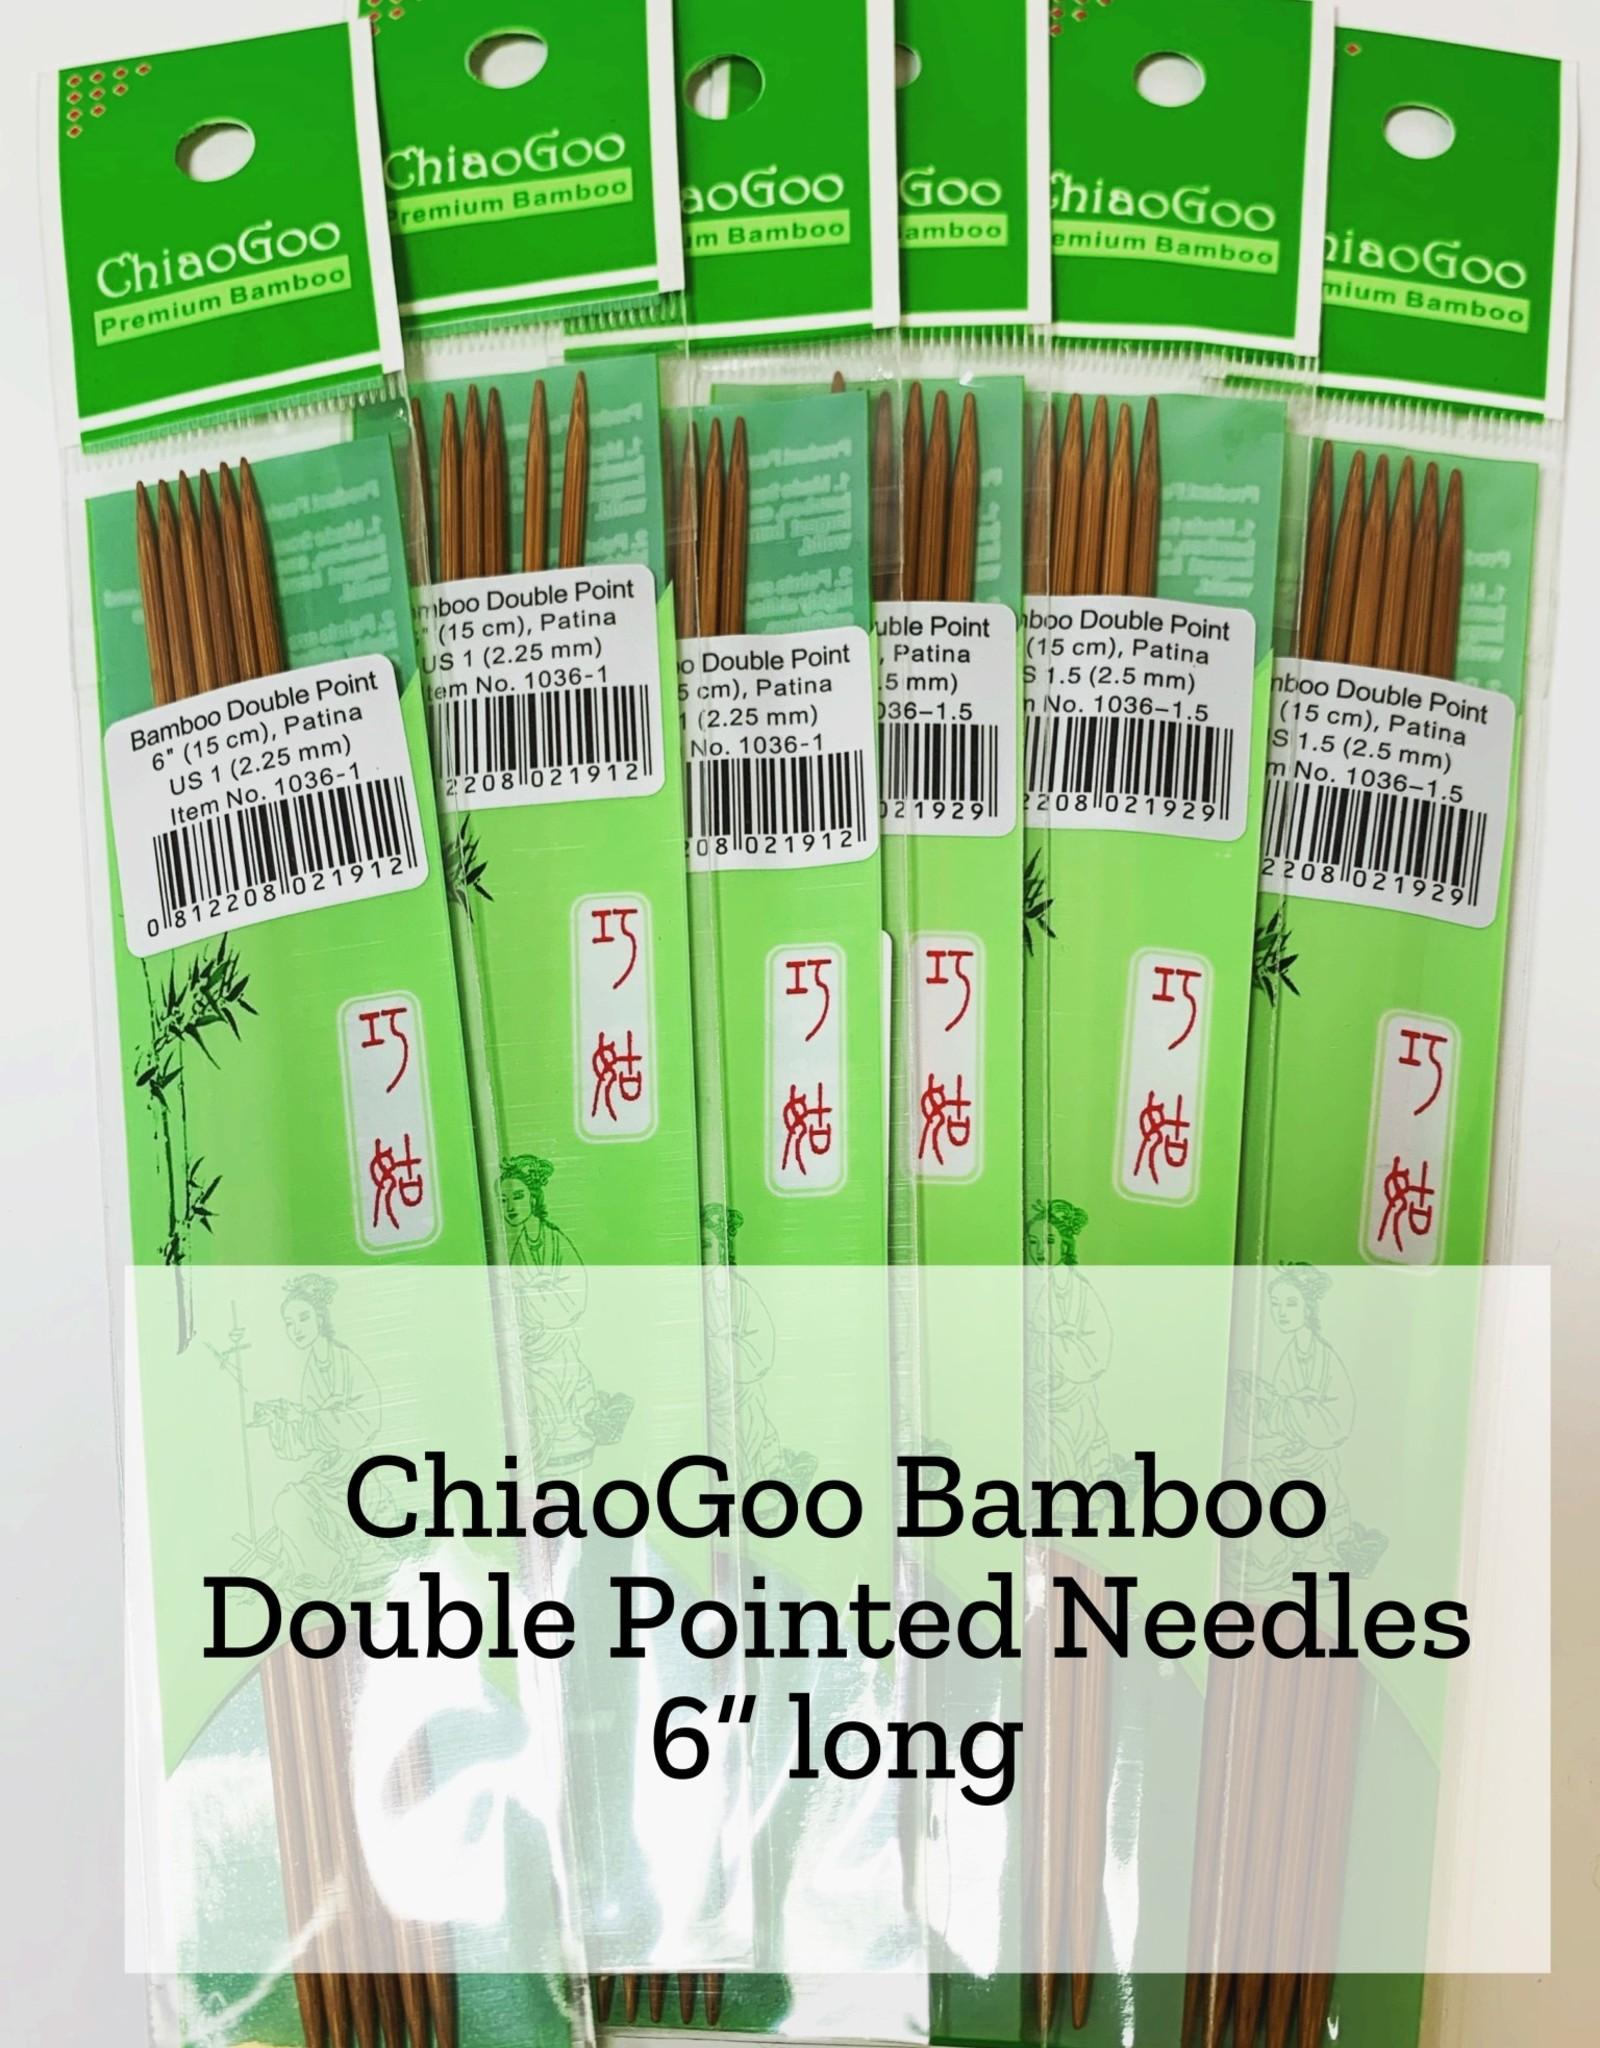 ChiaoGoo Bamboo DPN - 3 mm